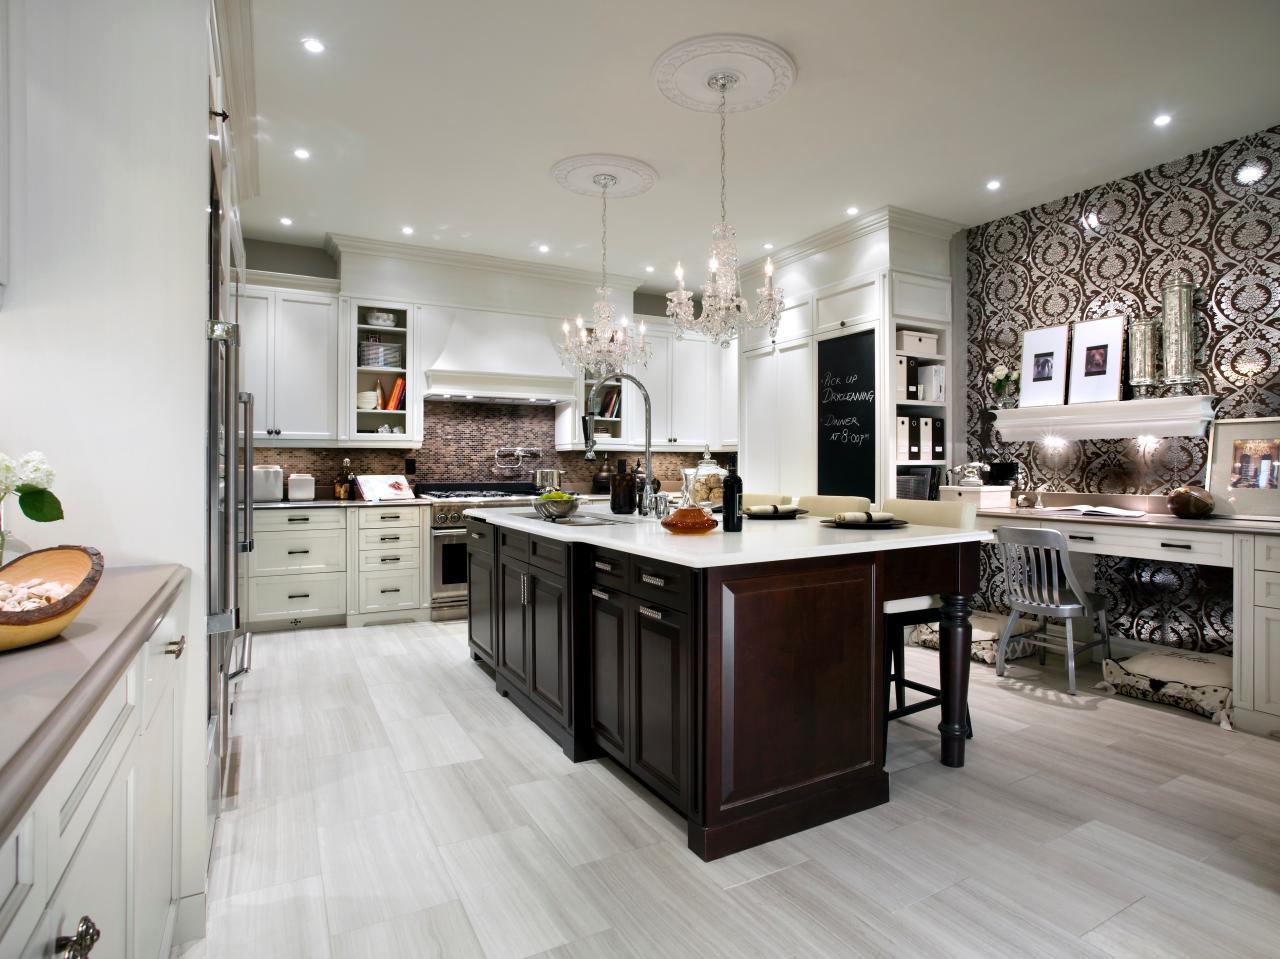 candice olson kitchen layouts photo - 4